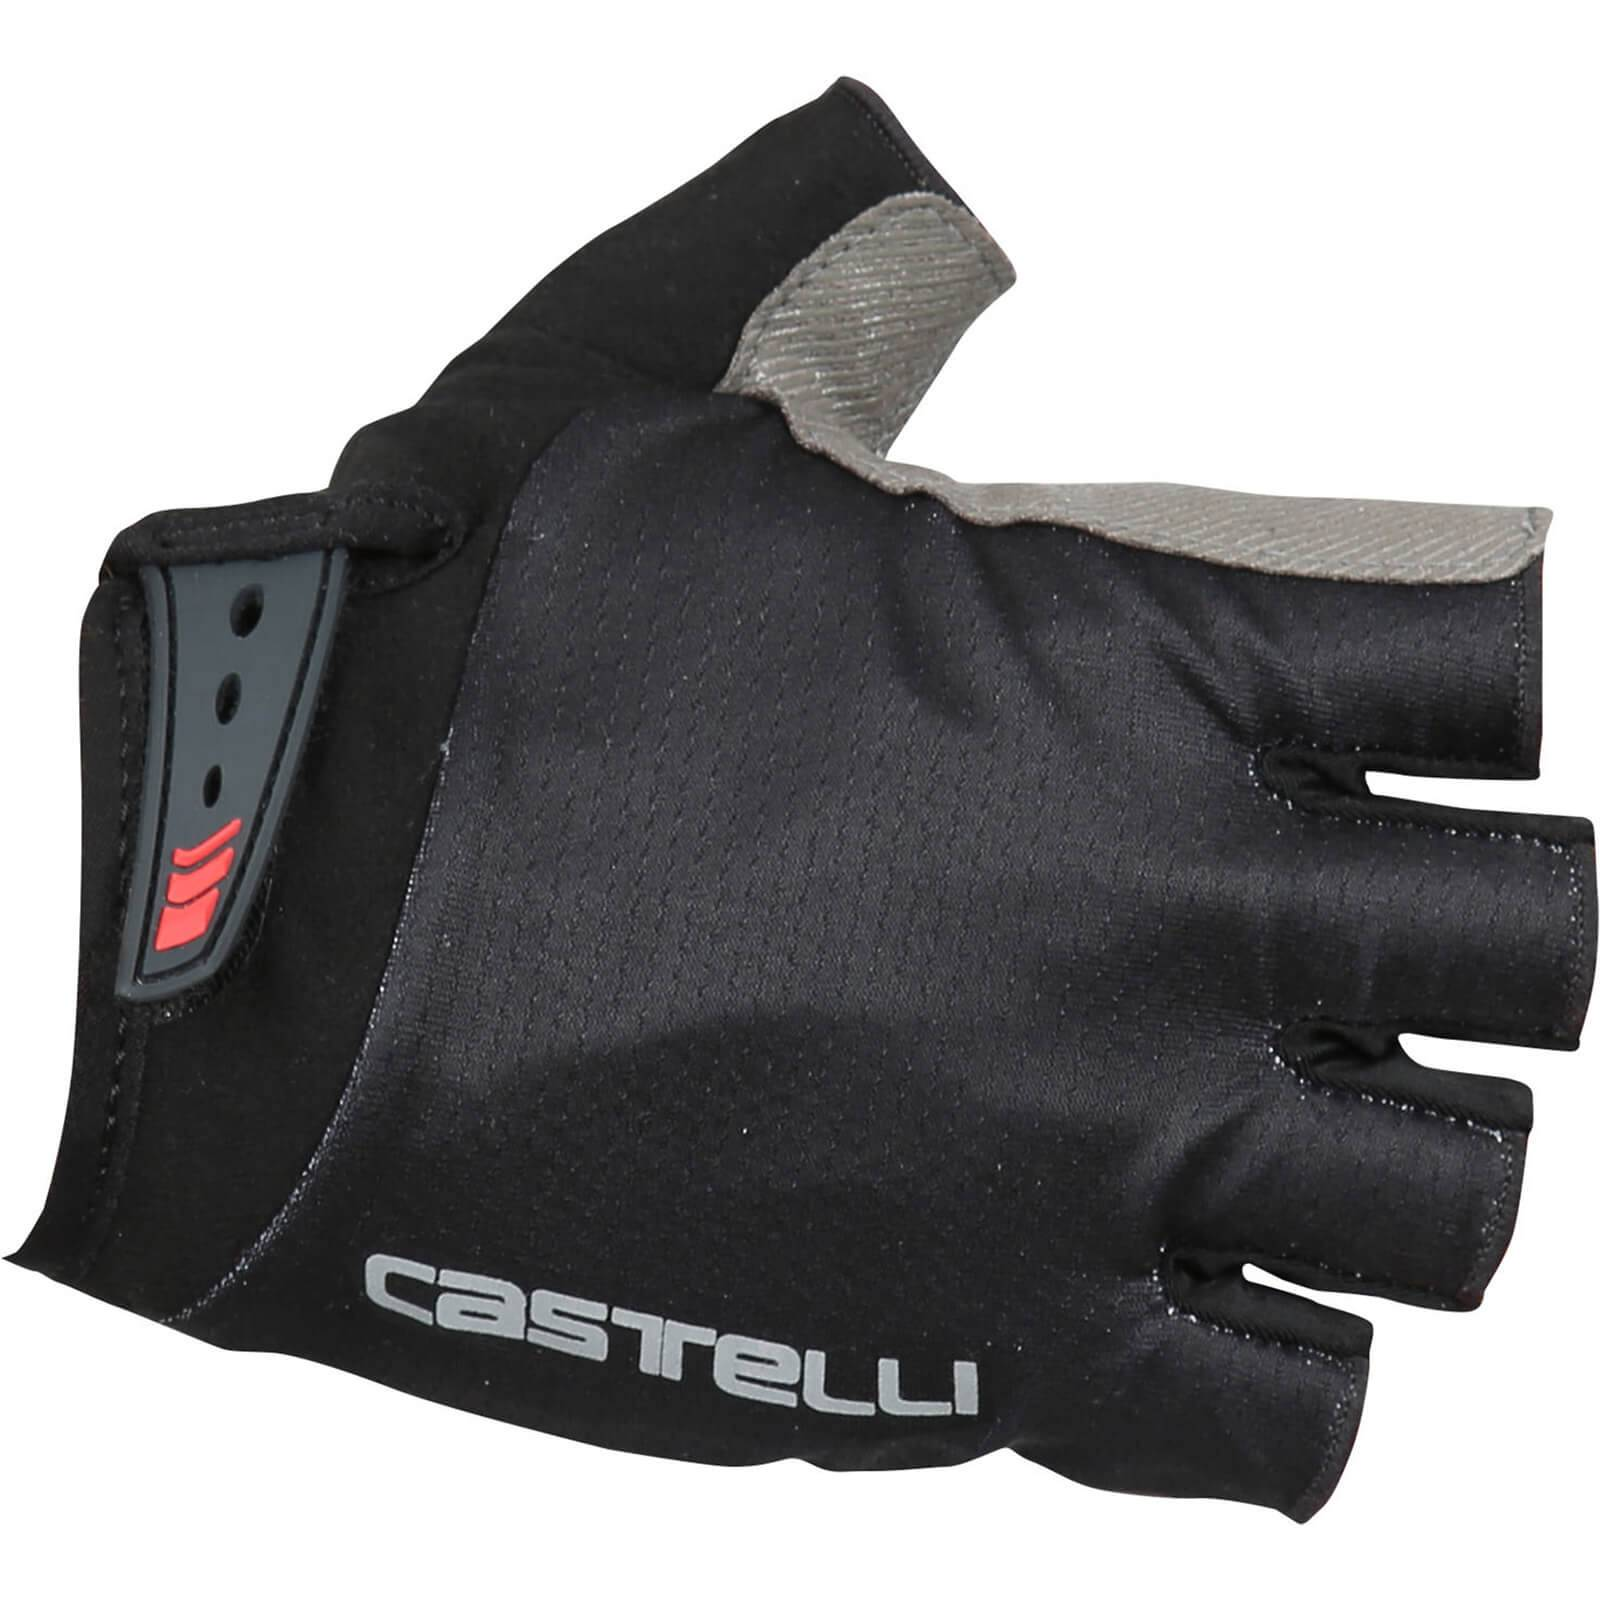 Castelli Entrata Gloves - Black - M - Black